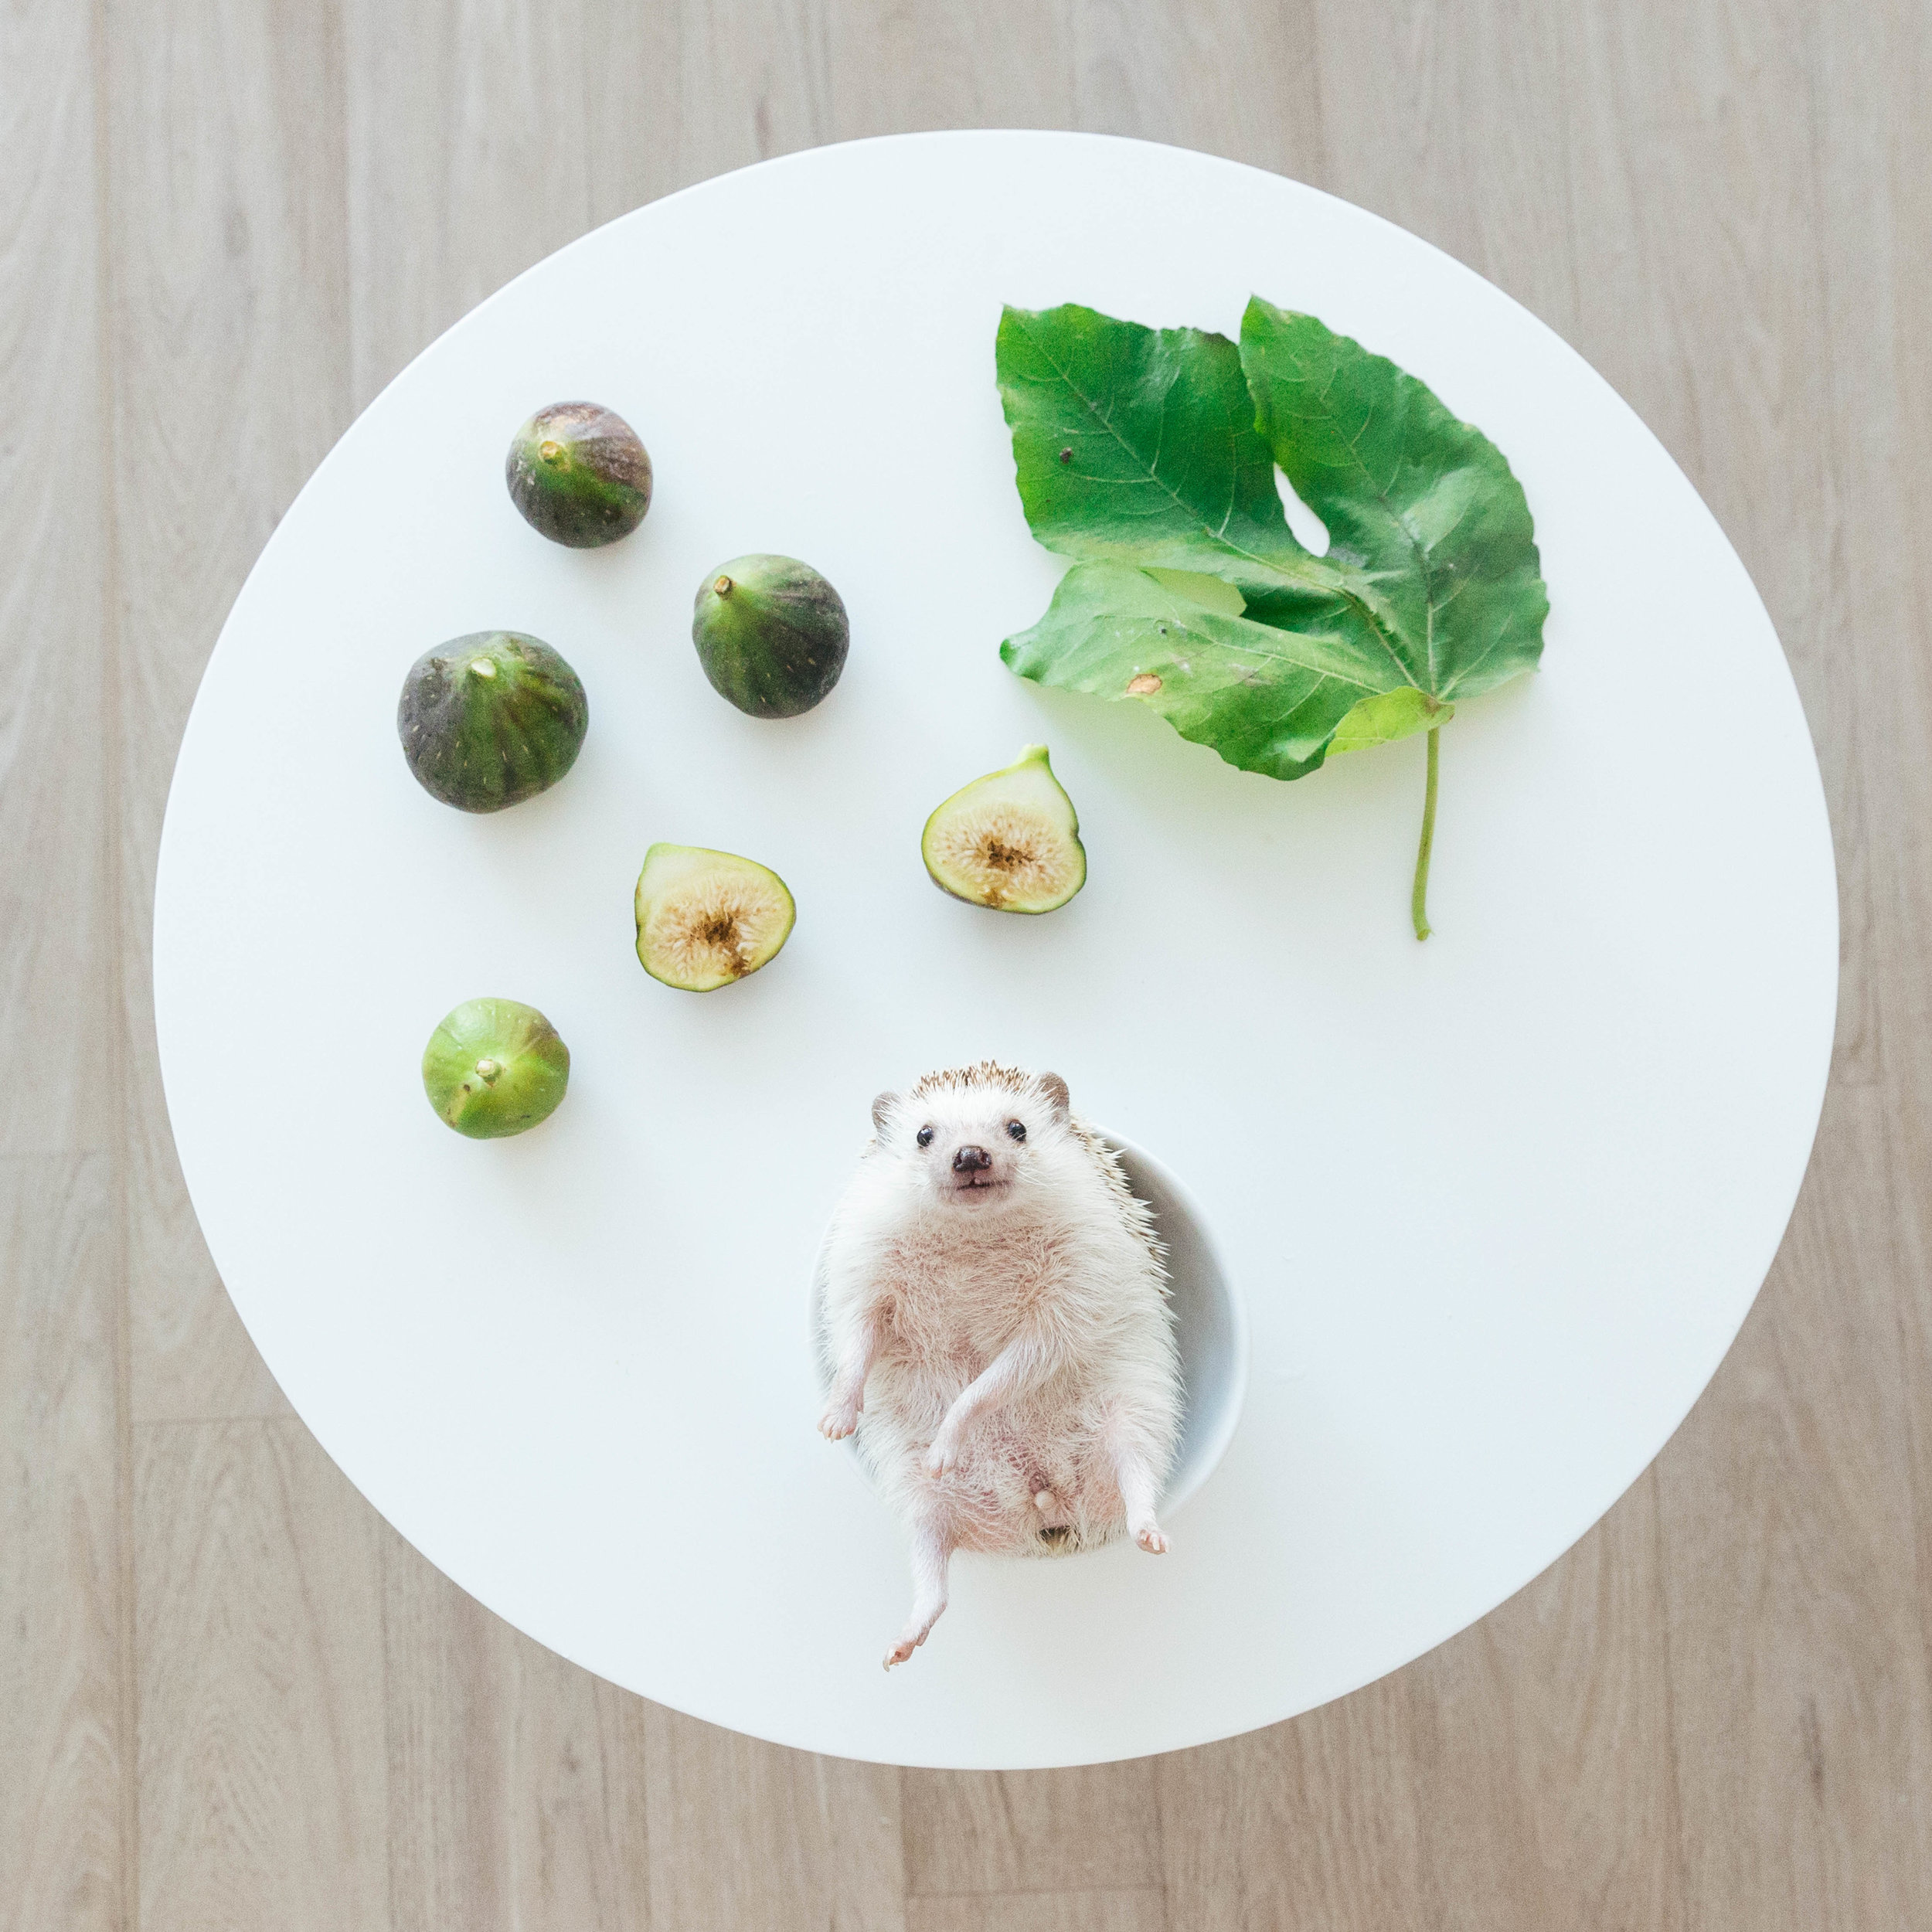 amelia-hedgehog-sophia-hsin-4.jpg